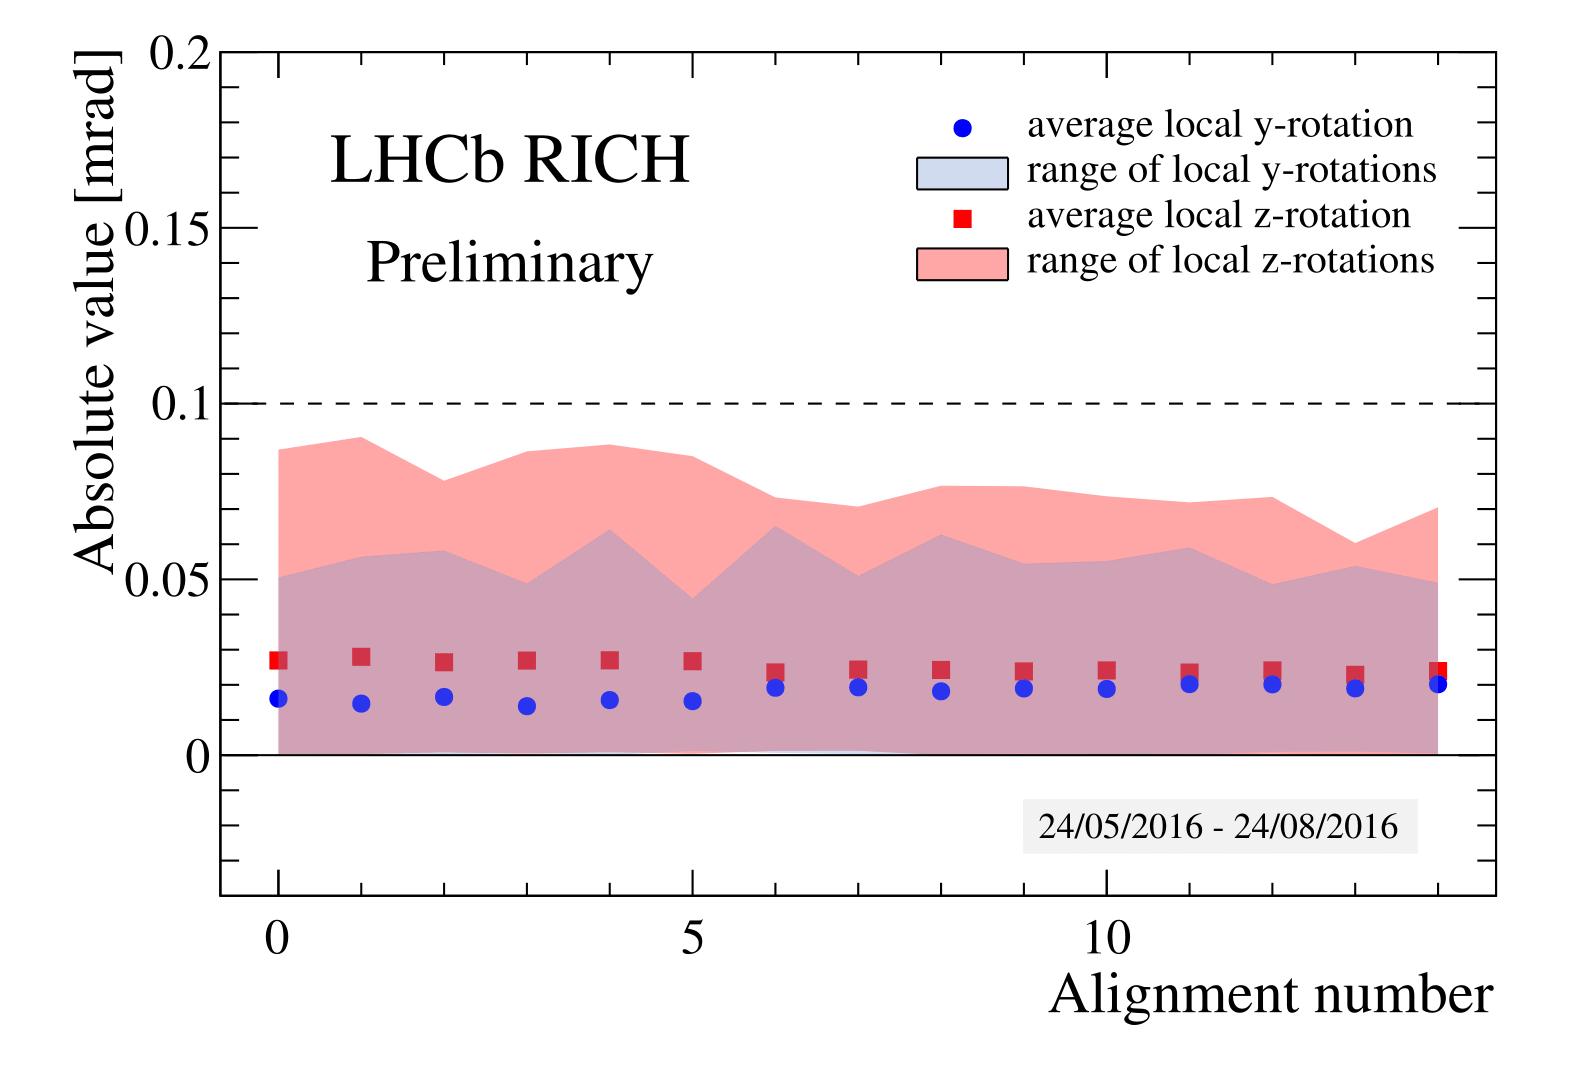 Rich2_absav_range.2-1.png